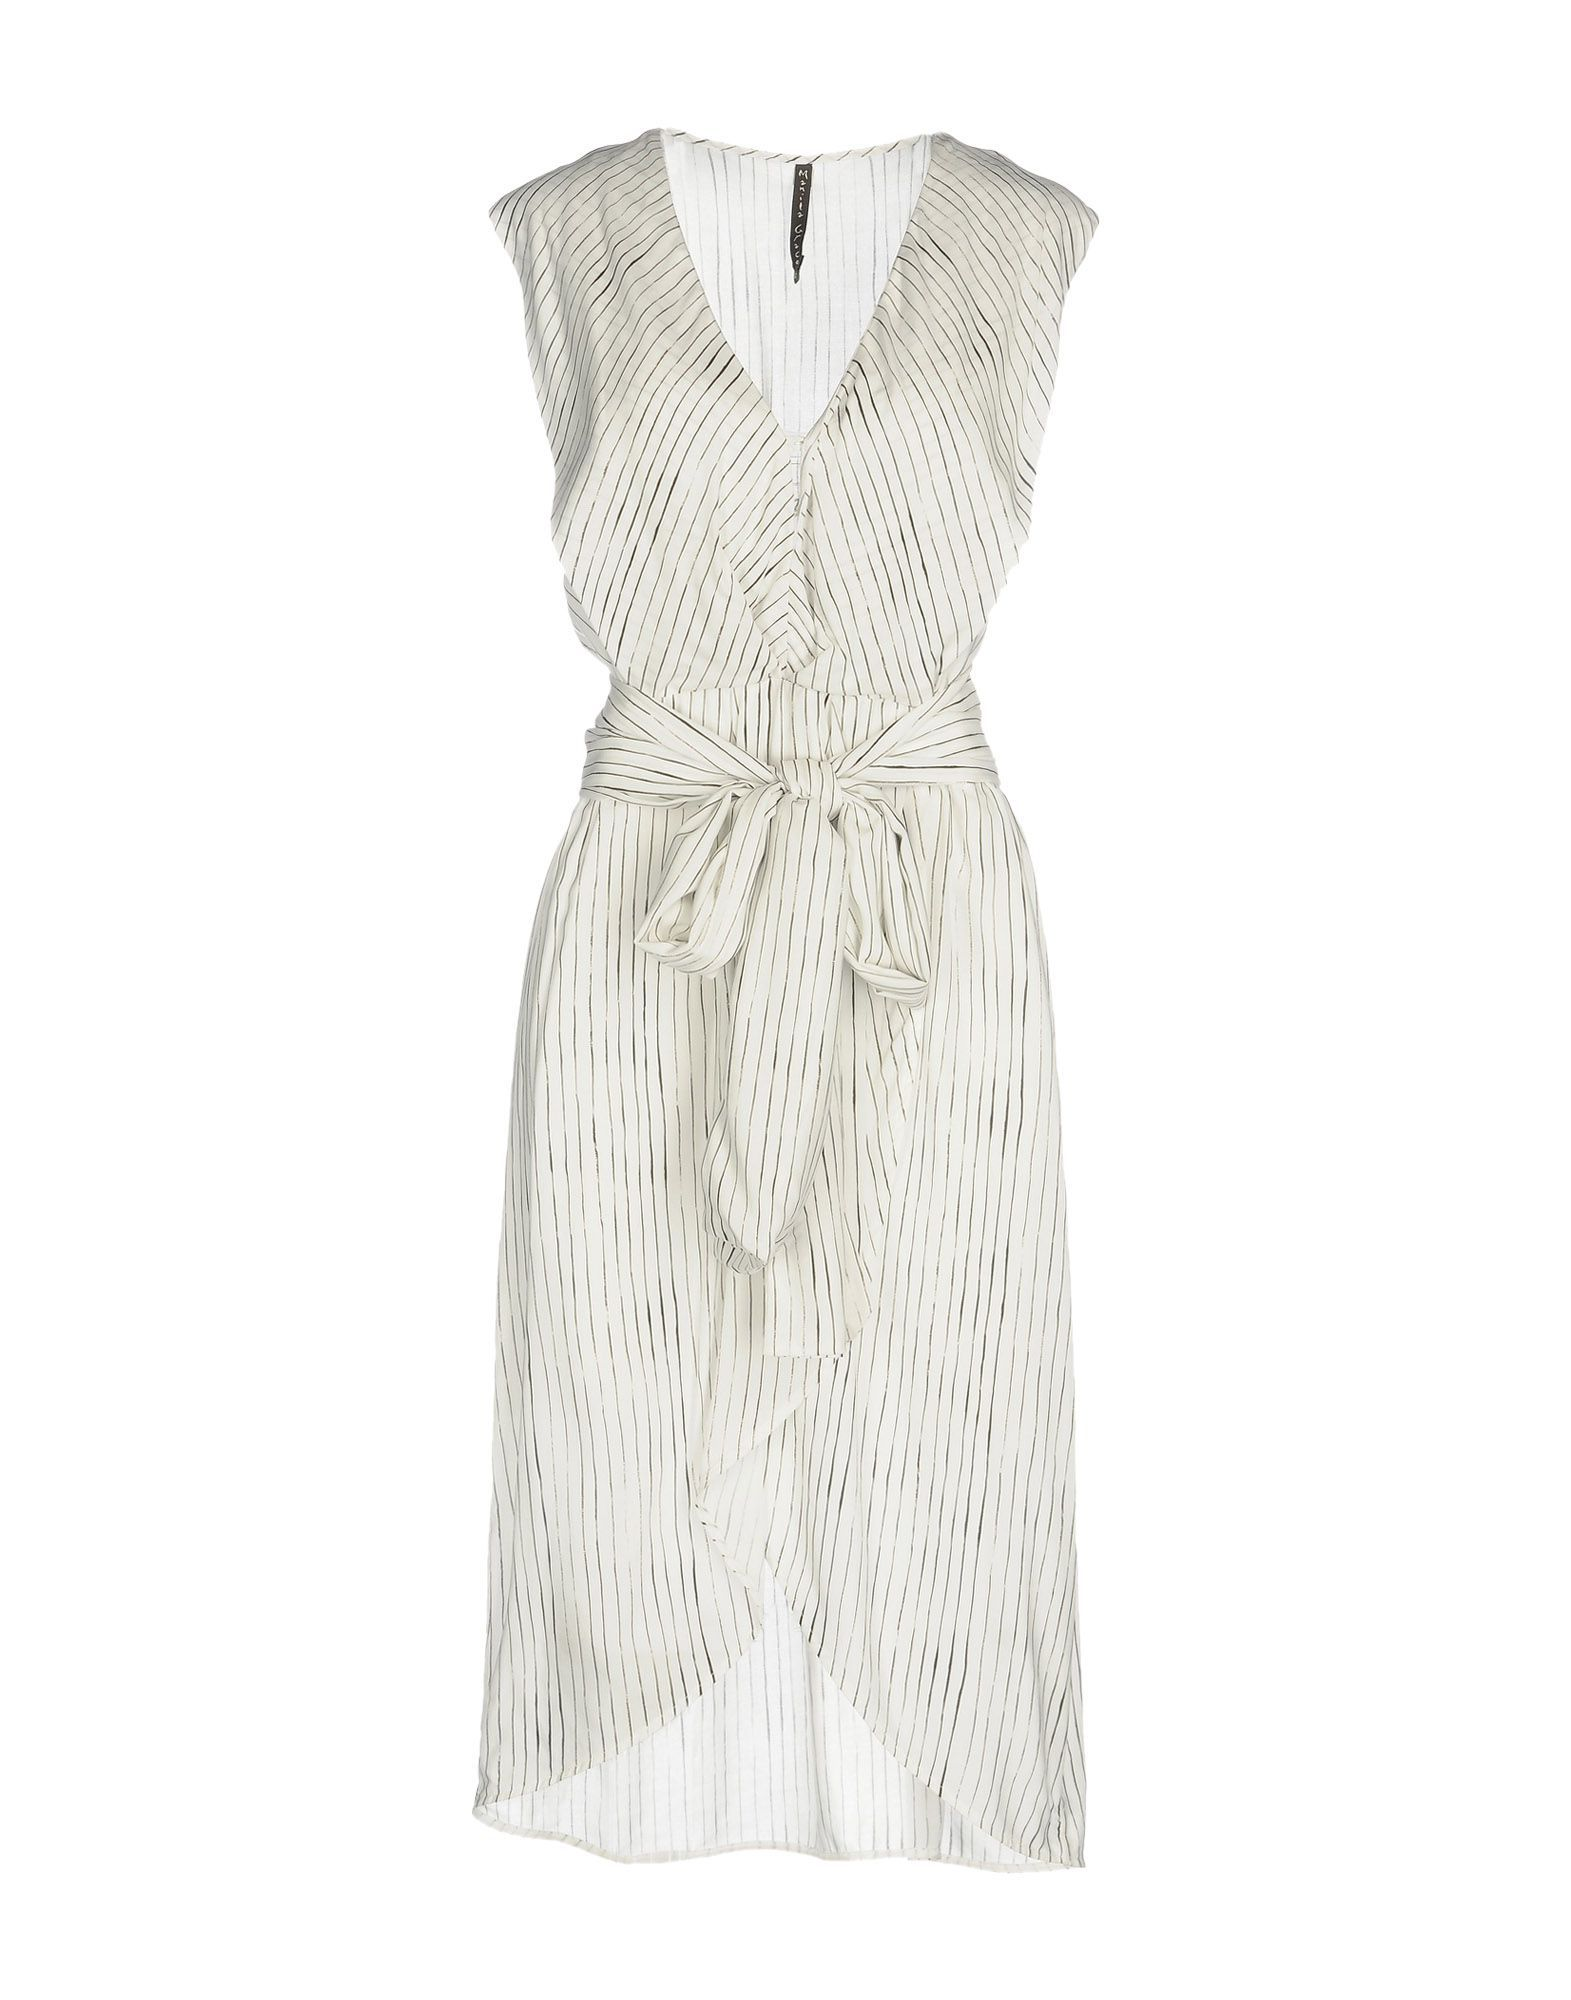 Manila Grace White Dress